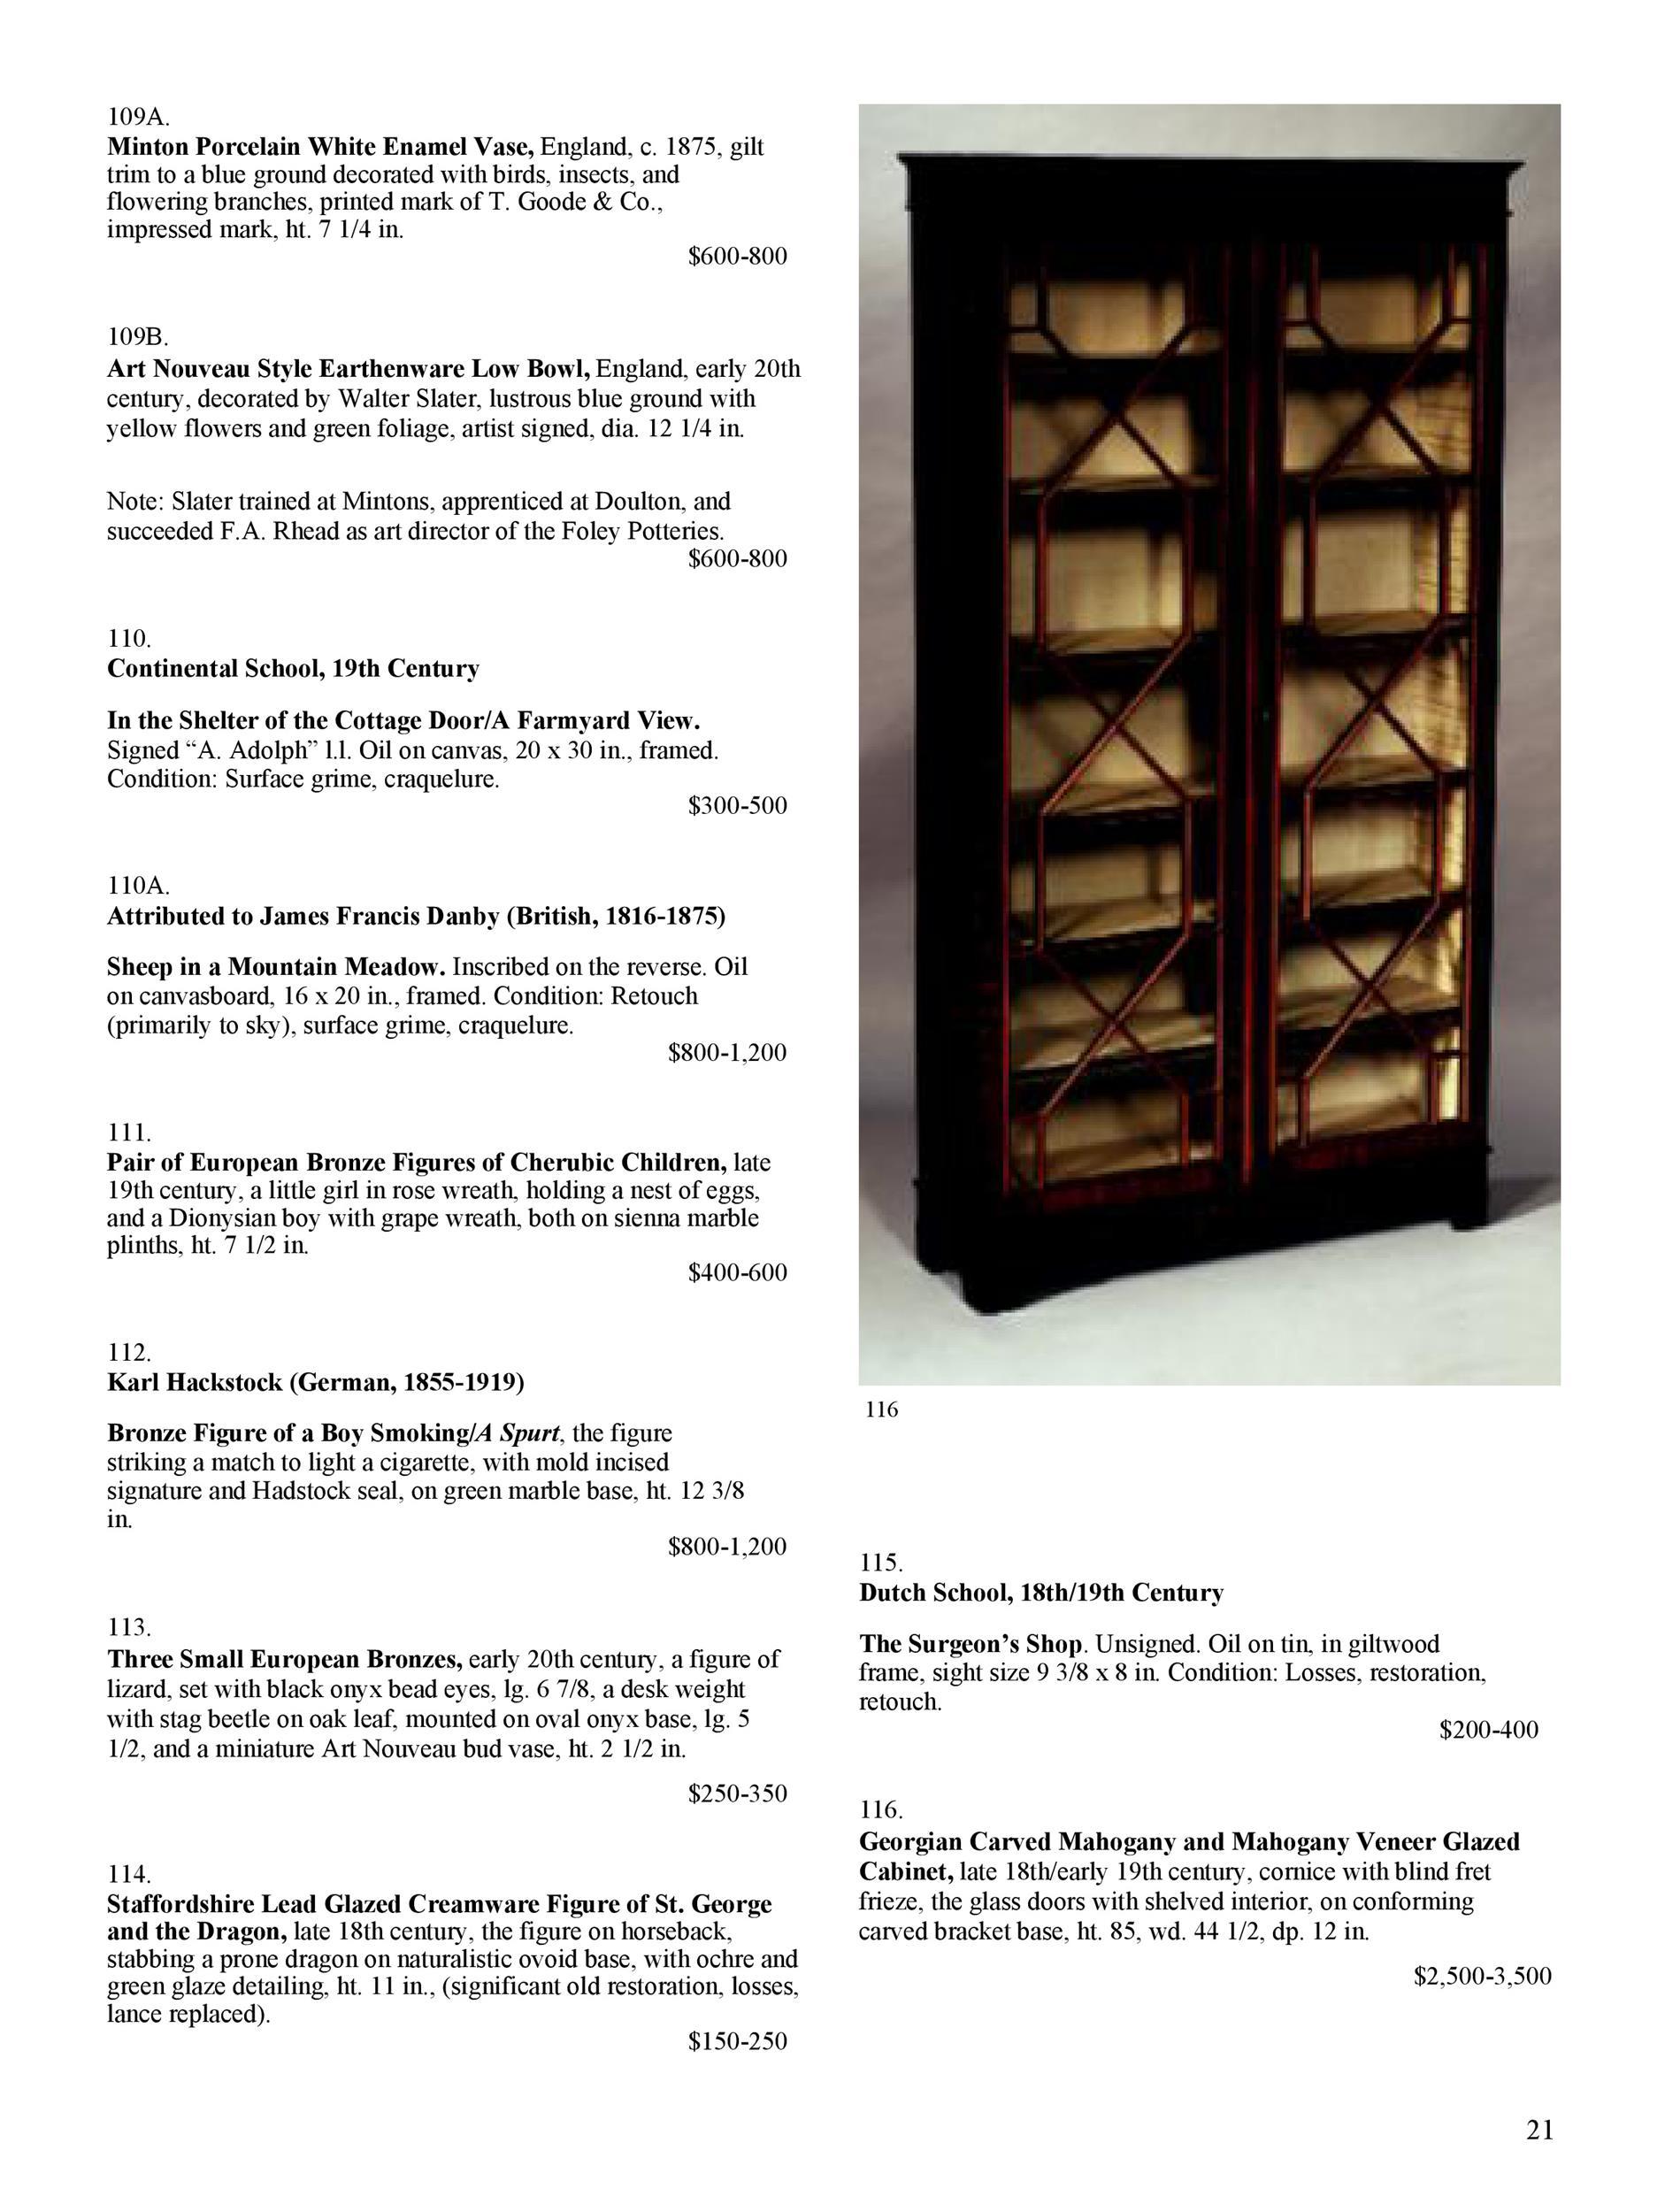 Free catalog template 23